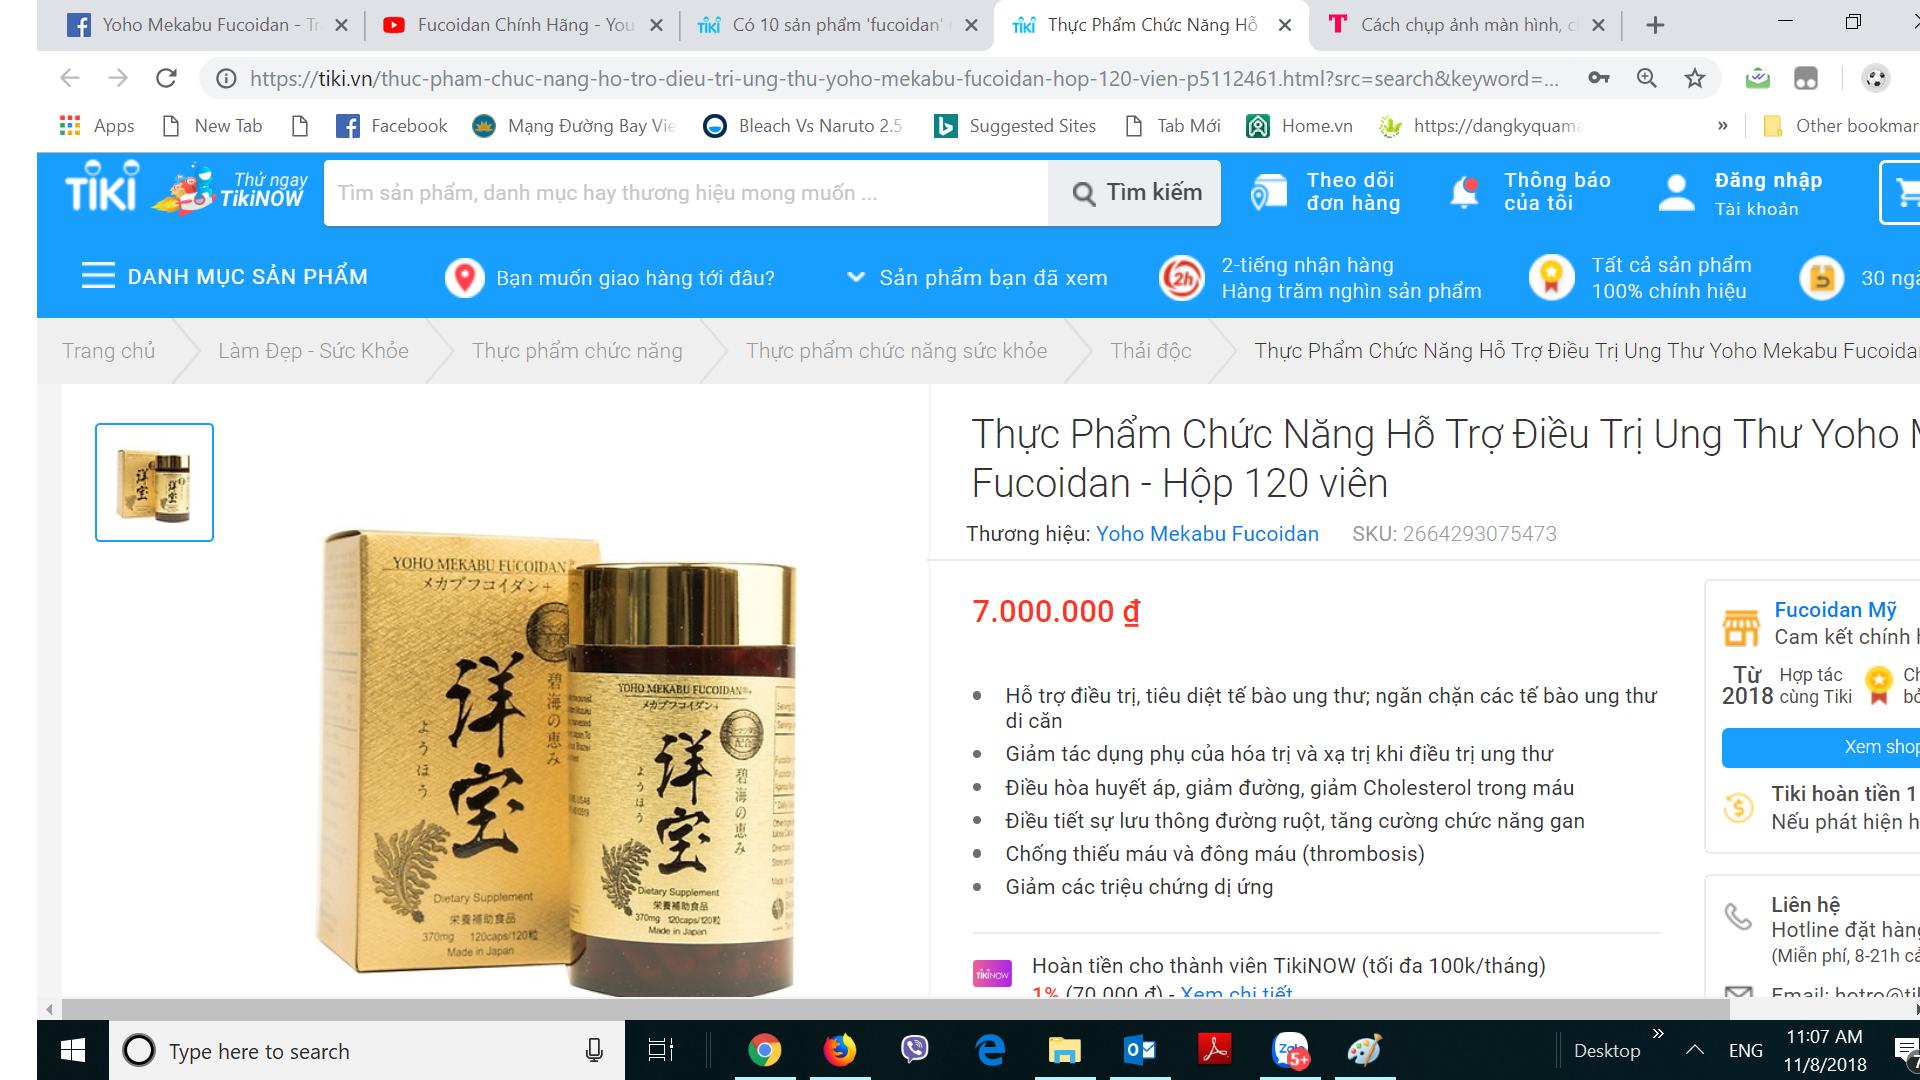 Mua Yoho Mekabu Fucoidan chính hãng trên tiki.vn